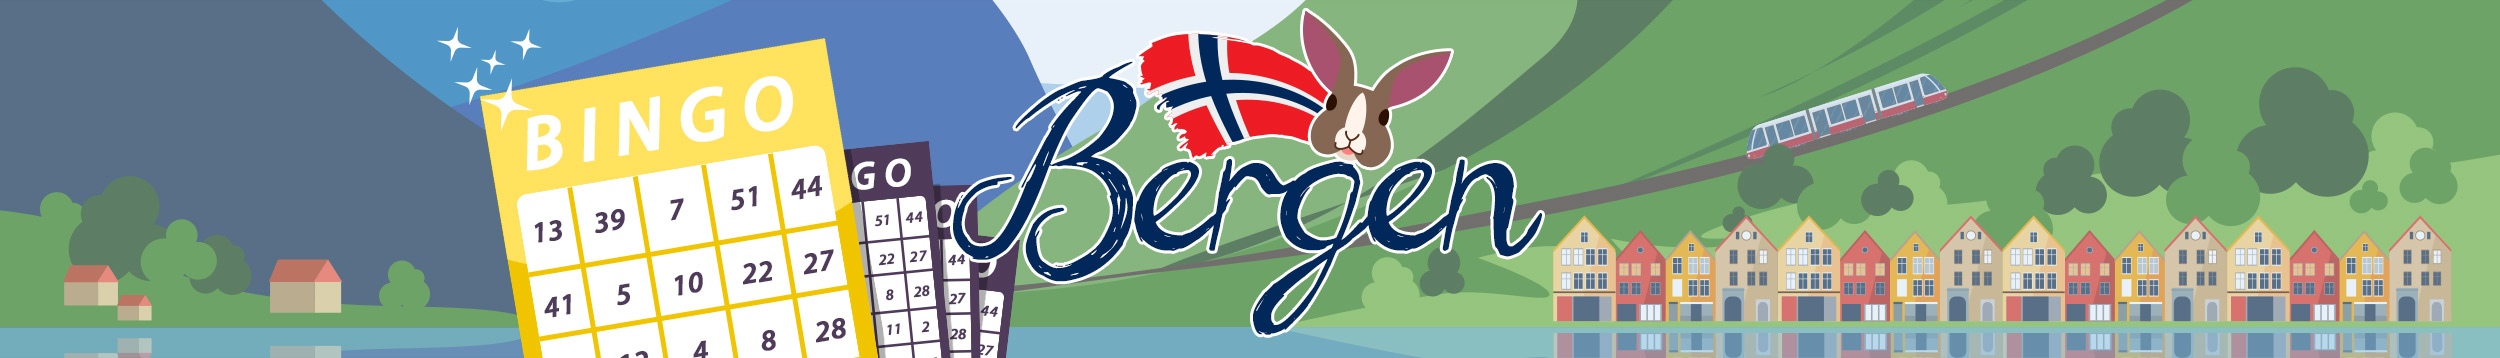 Spela bingo i Bergen!